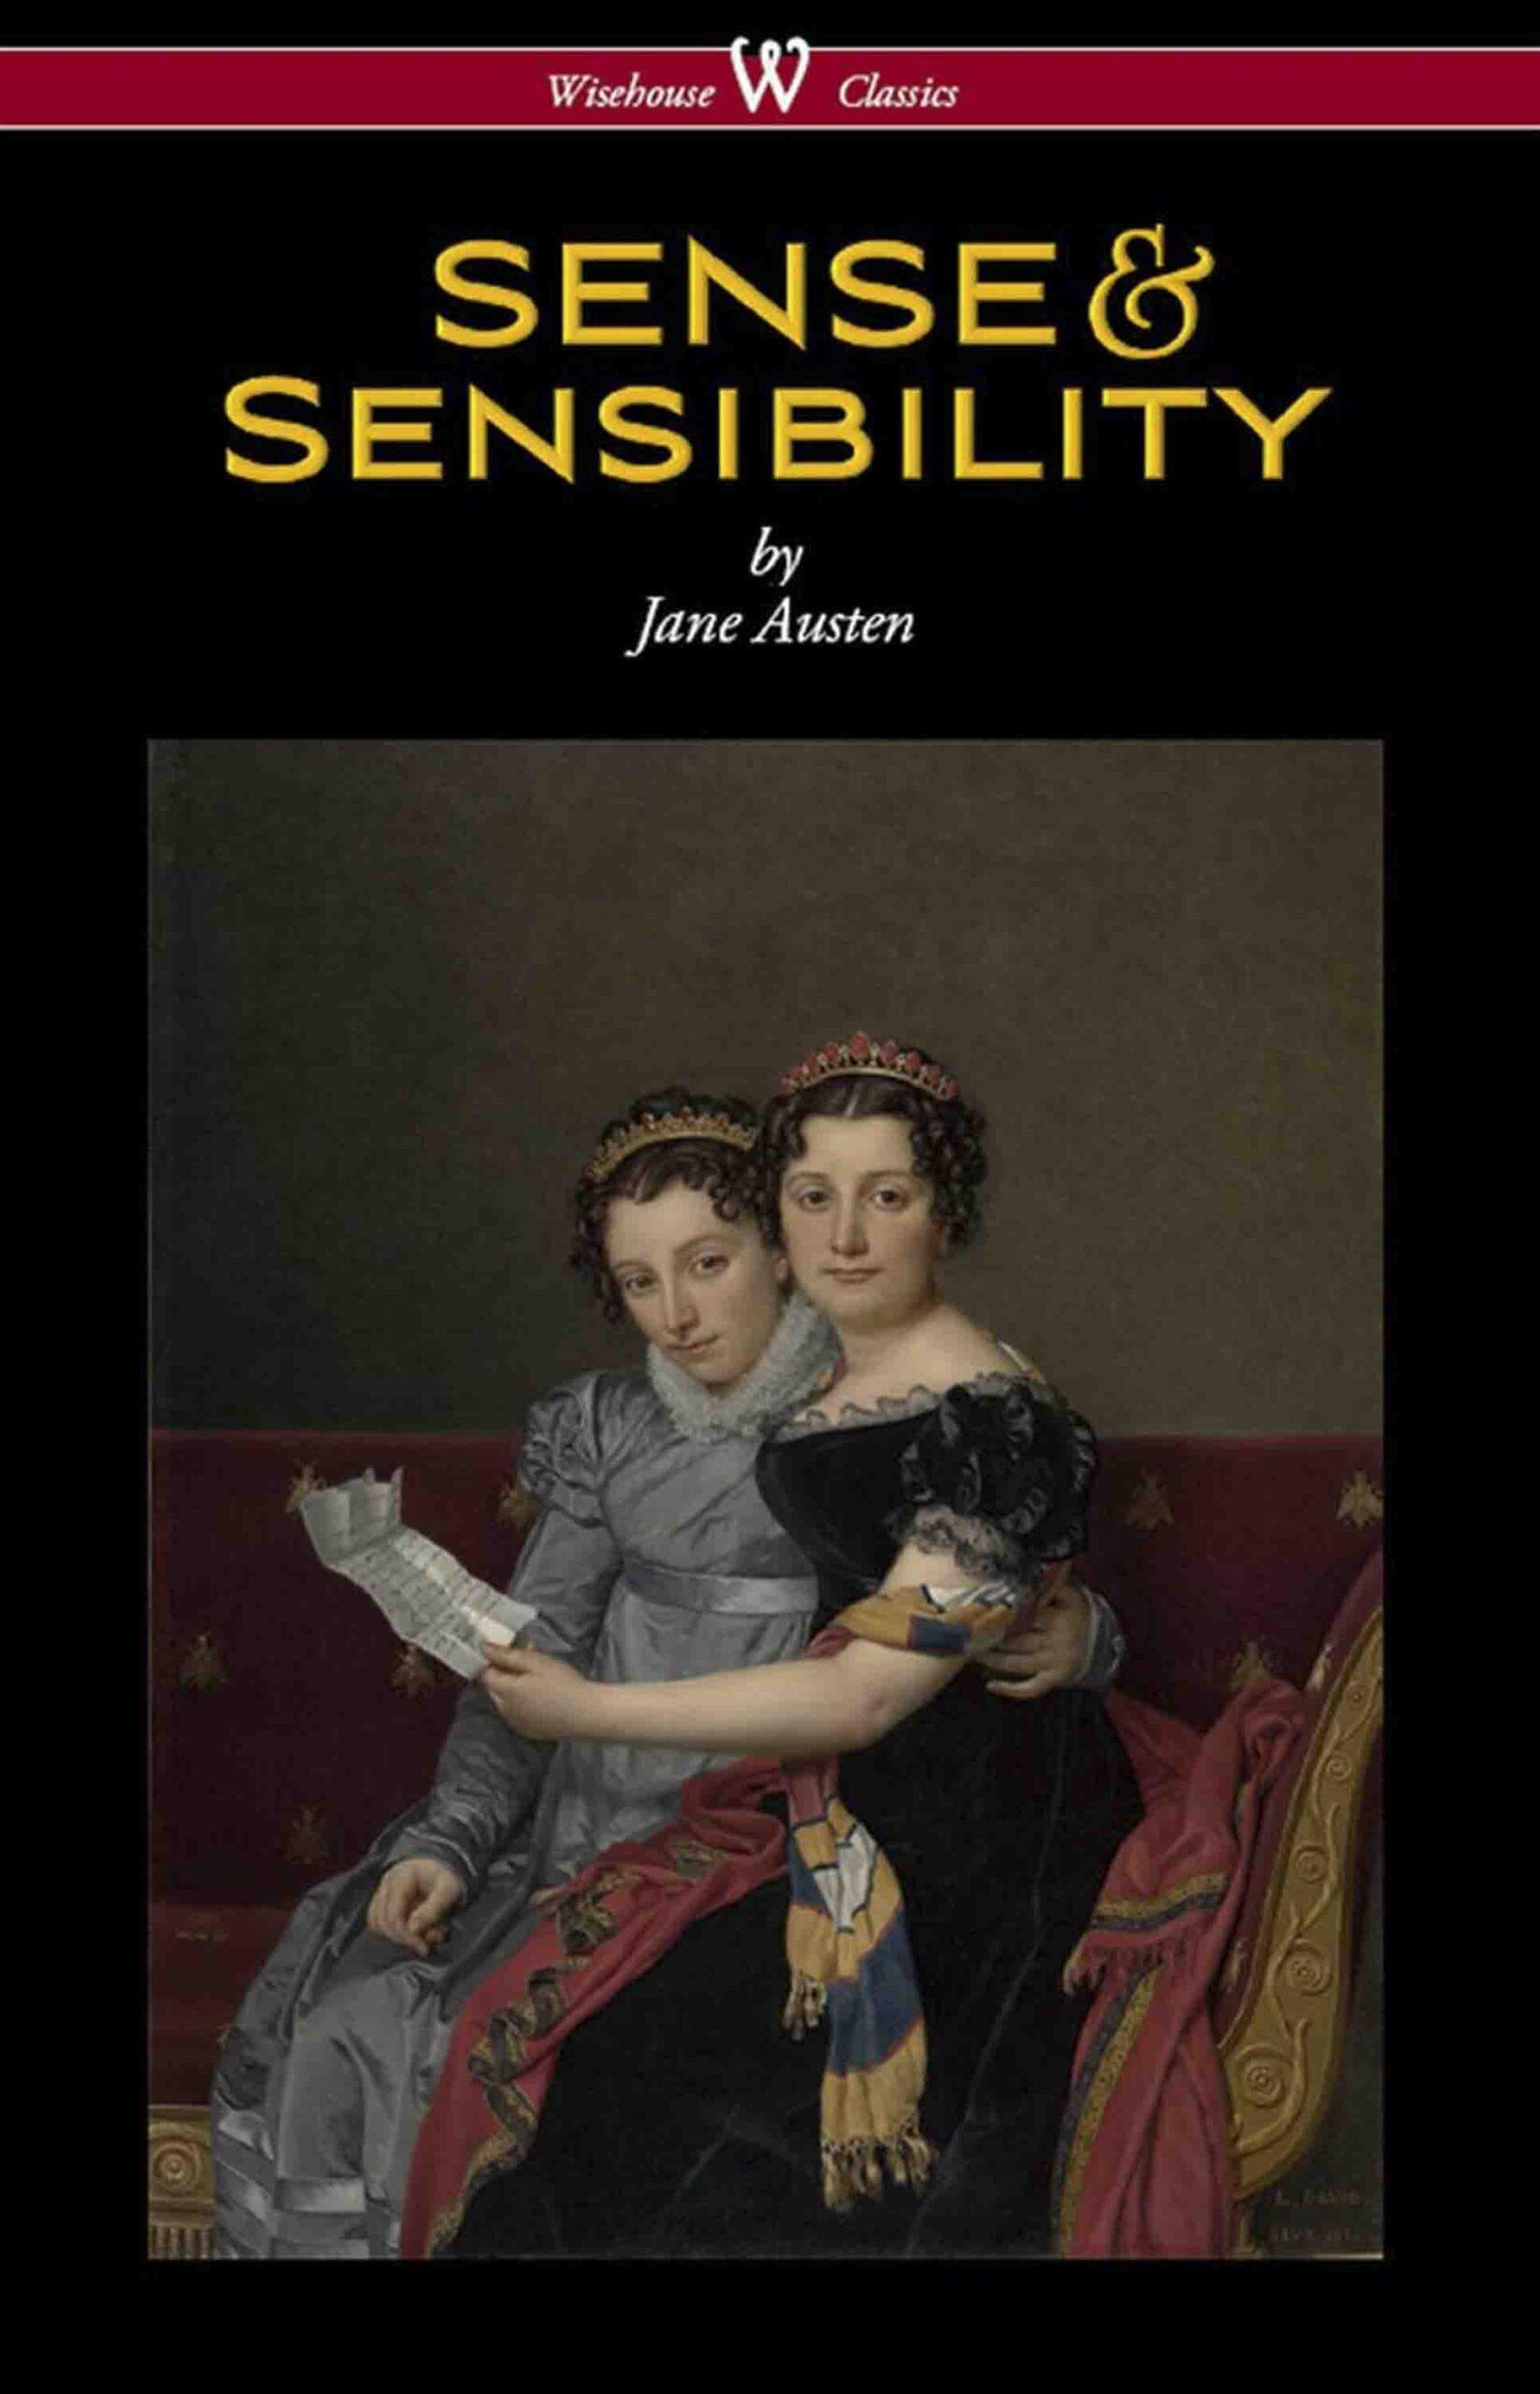 Sense and Sensibility (Wisehouse Classics Edition)